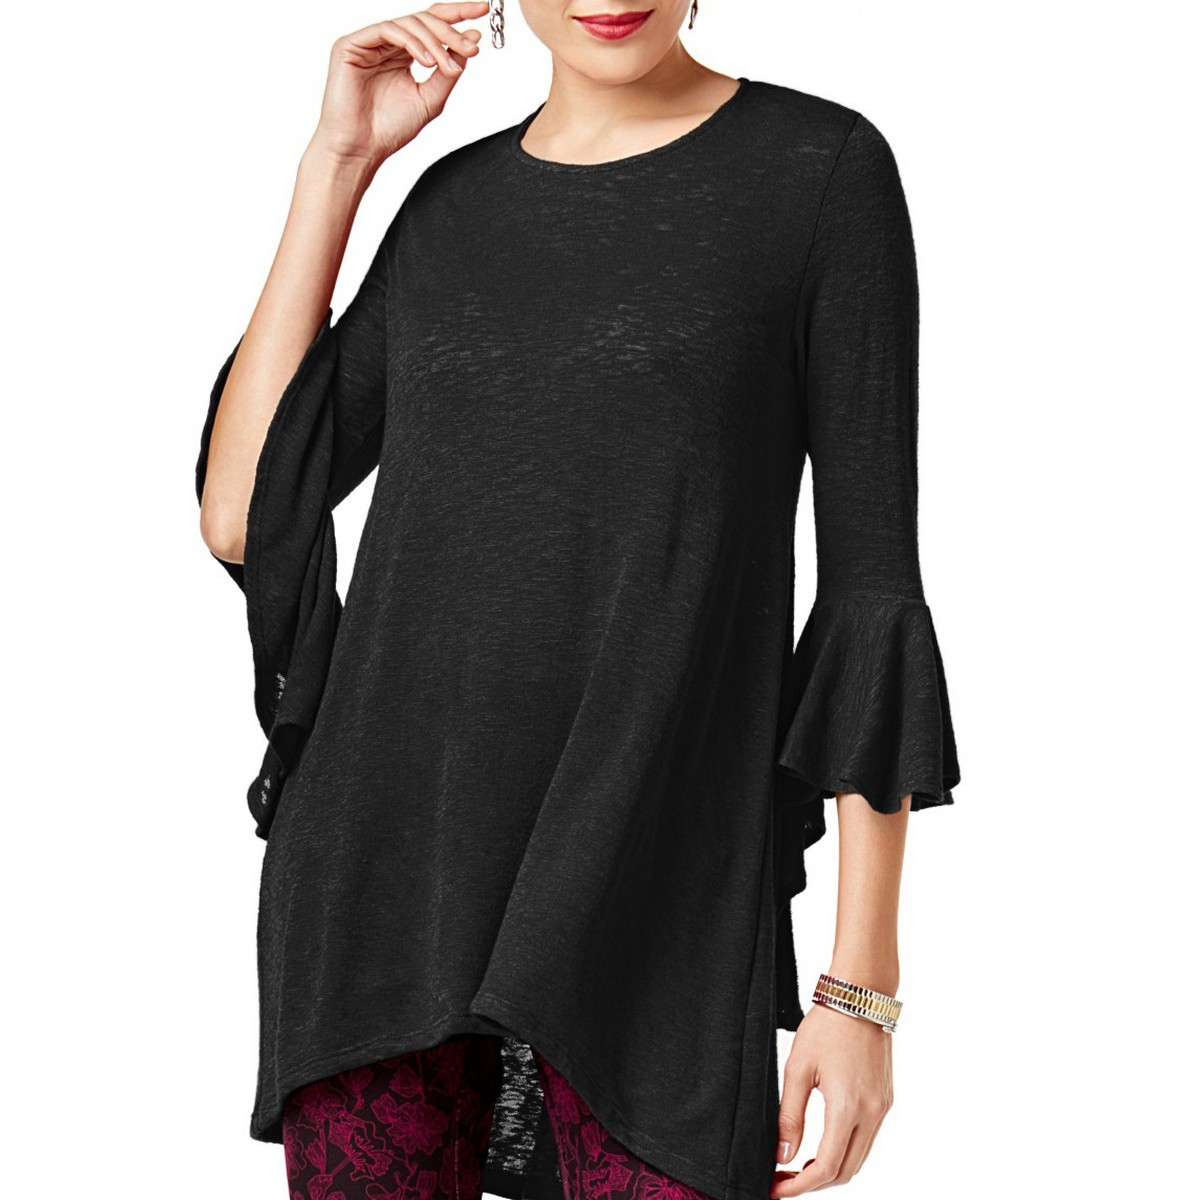 ALFANI-NEW-Women-039-s-High-low-Bell-sleeve-Knit-Tunic-Shirt-Top-TEDO thumbnail 2